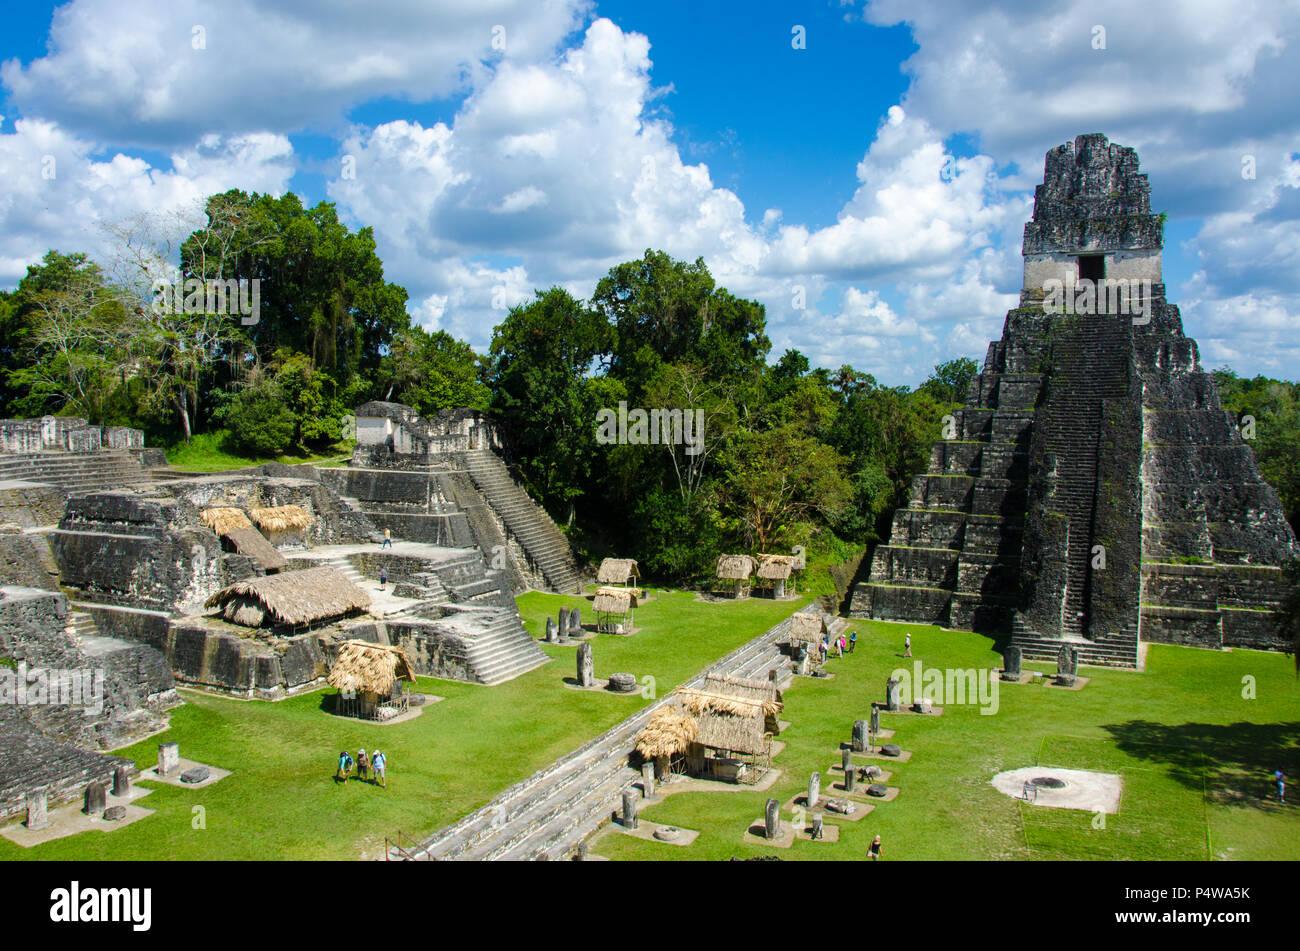 Tikal - Maya Ruins in the rainforest of Guatemala - Stock Image